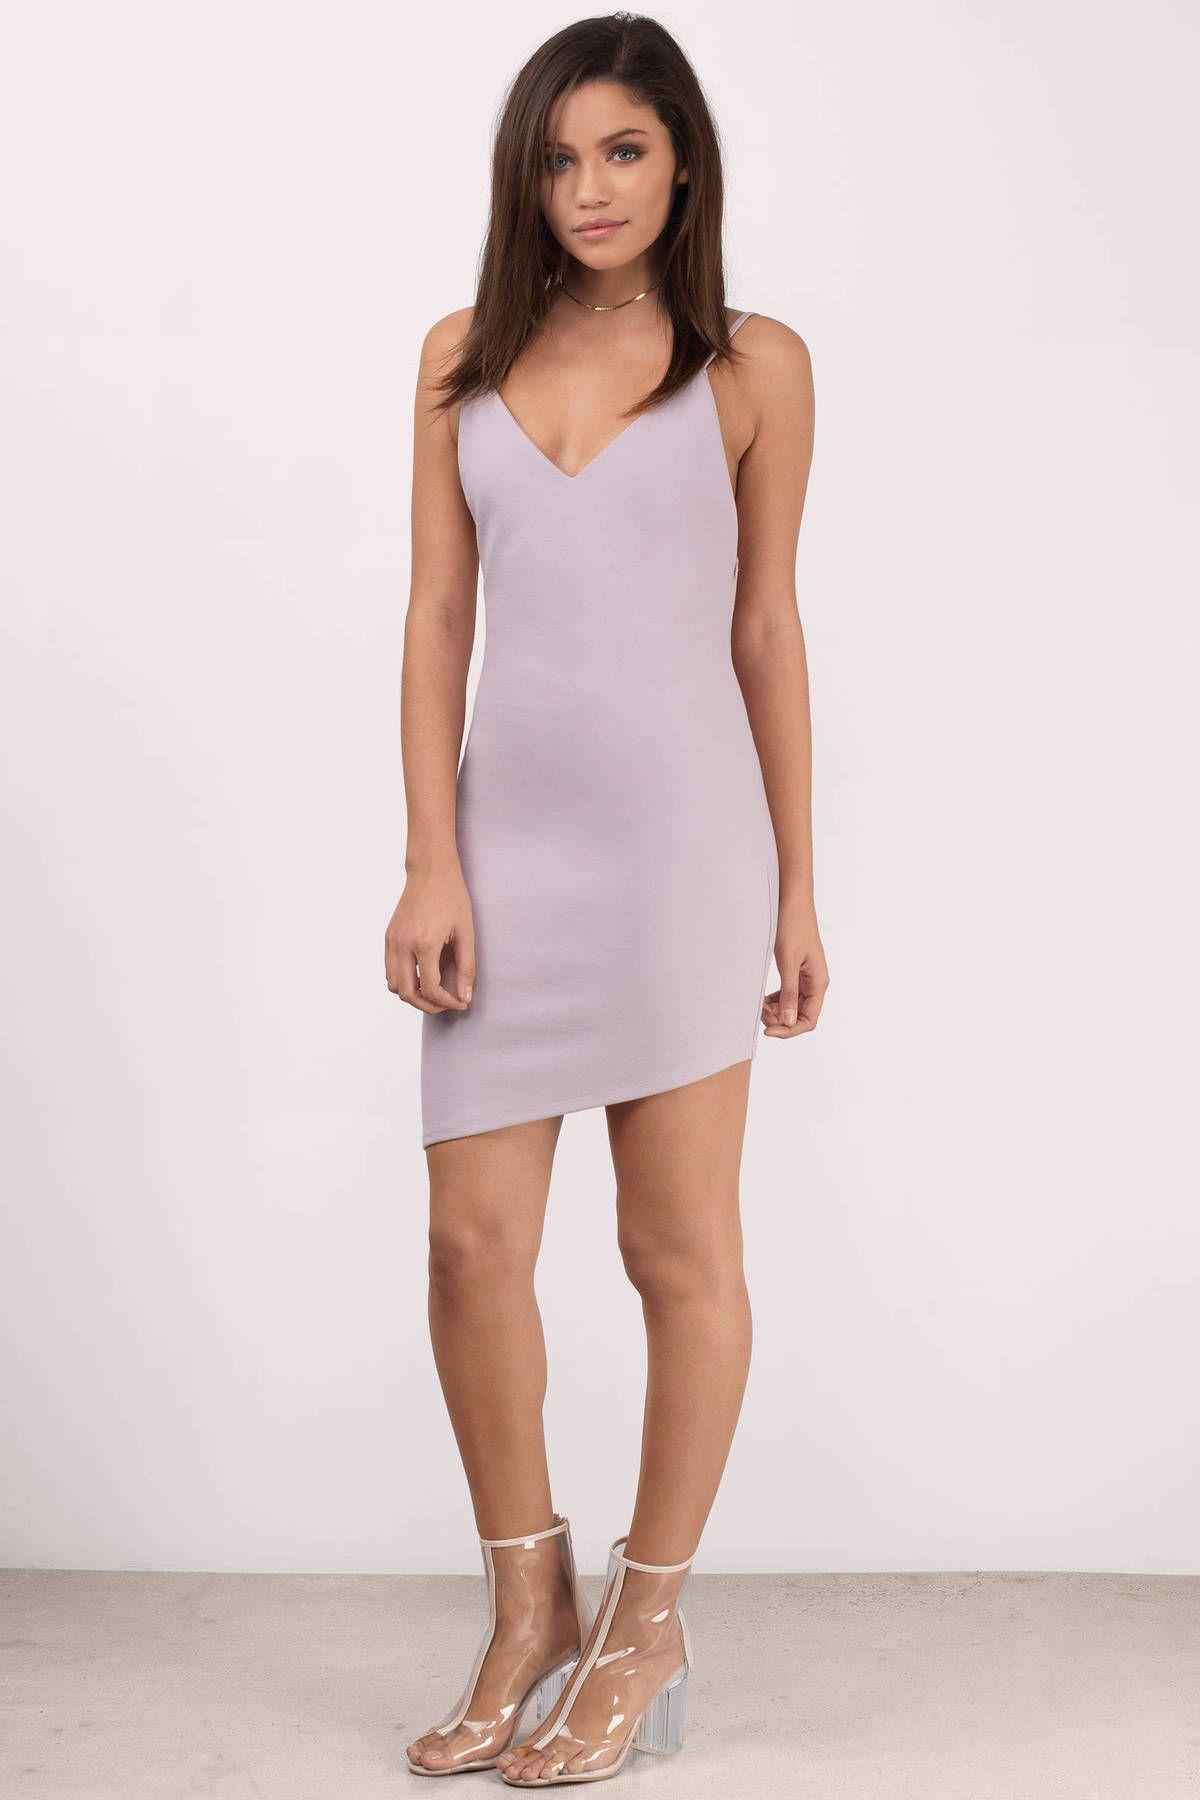 Frances Low Back Mini Bodycon Dress In Mauve Bodycon Cocktail Dress Womens Trendy Dresses Bodycon Dress [ 1800 x 1200 Pixel ]